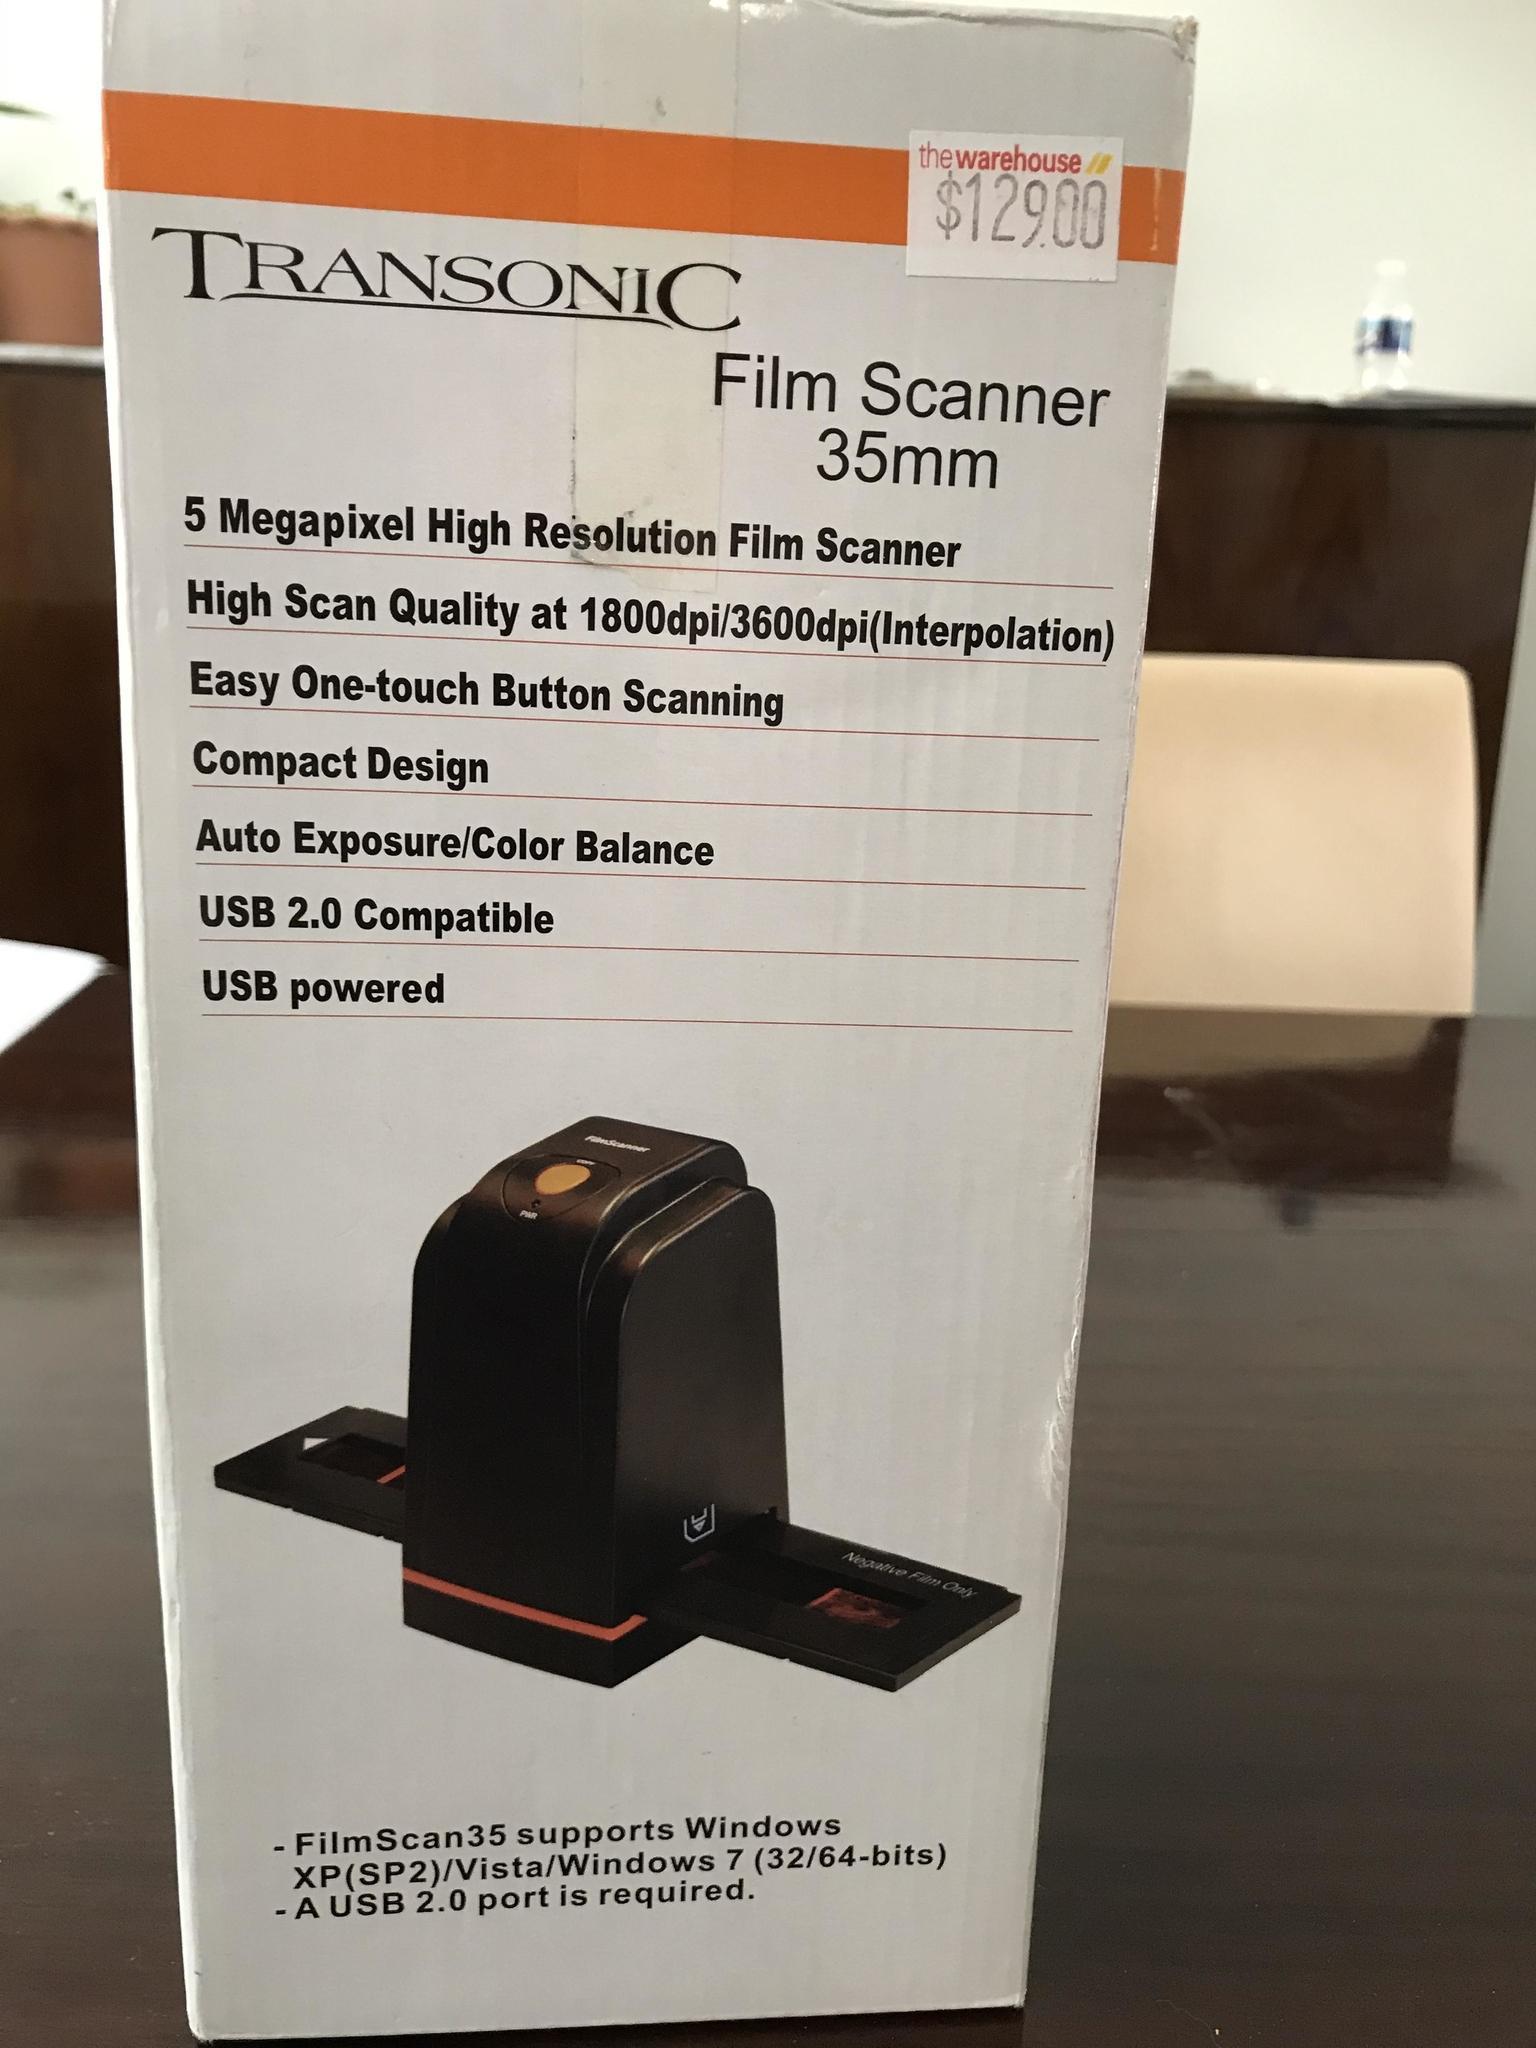 Transonic film scanner 35 mm